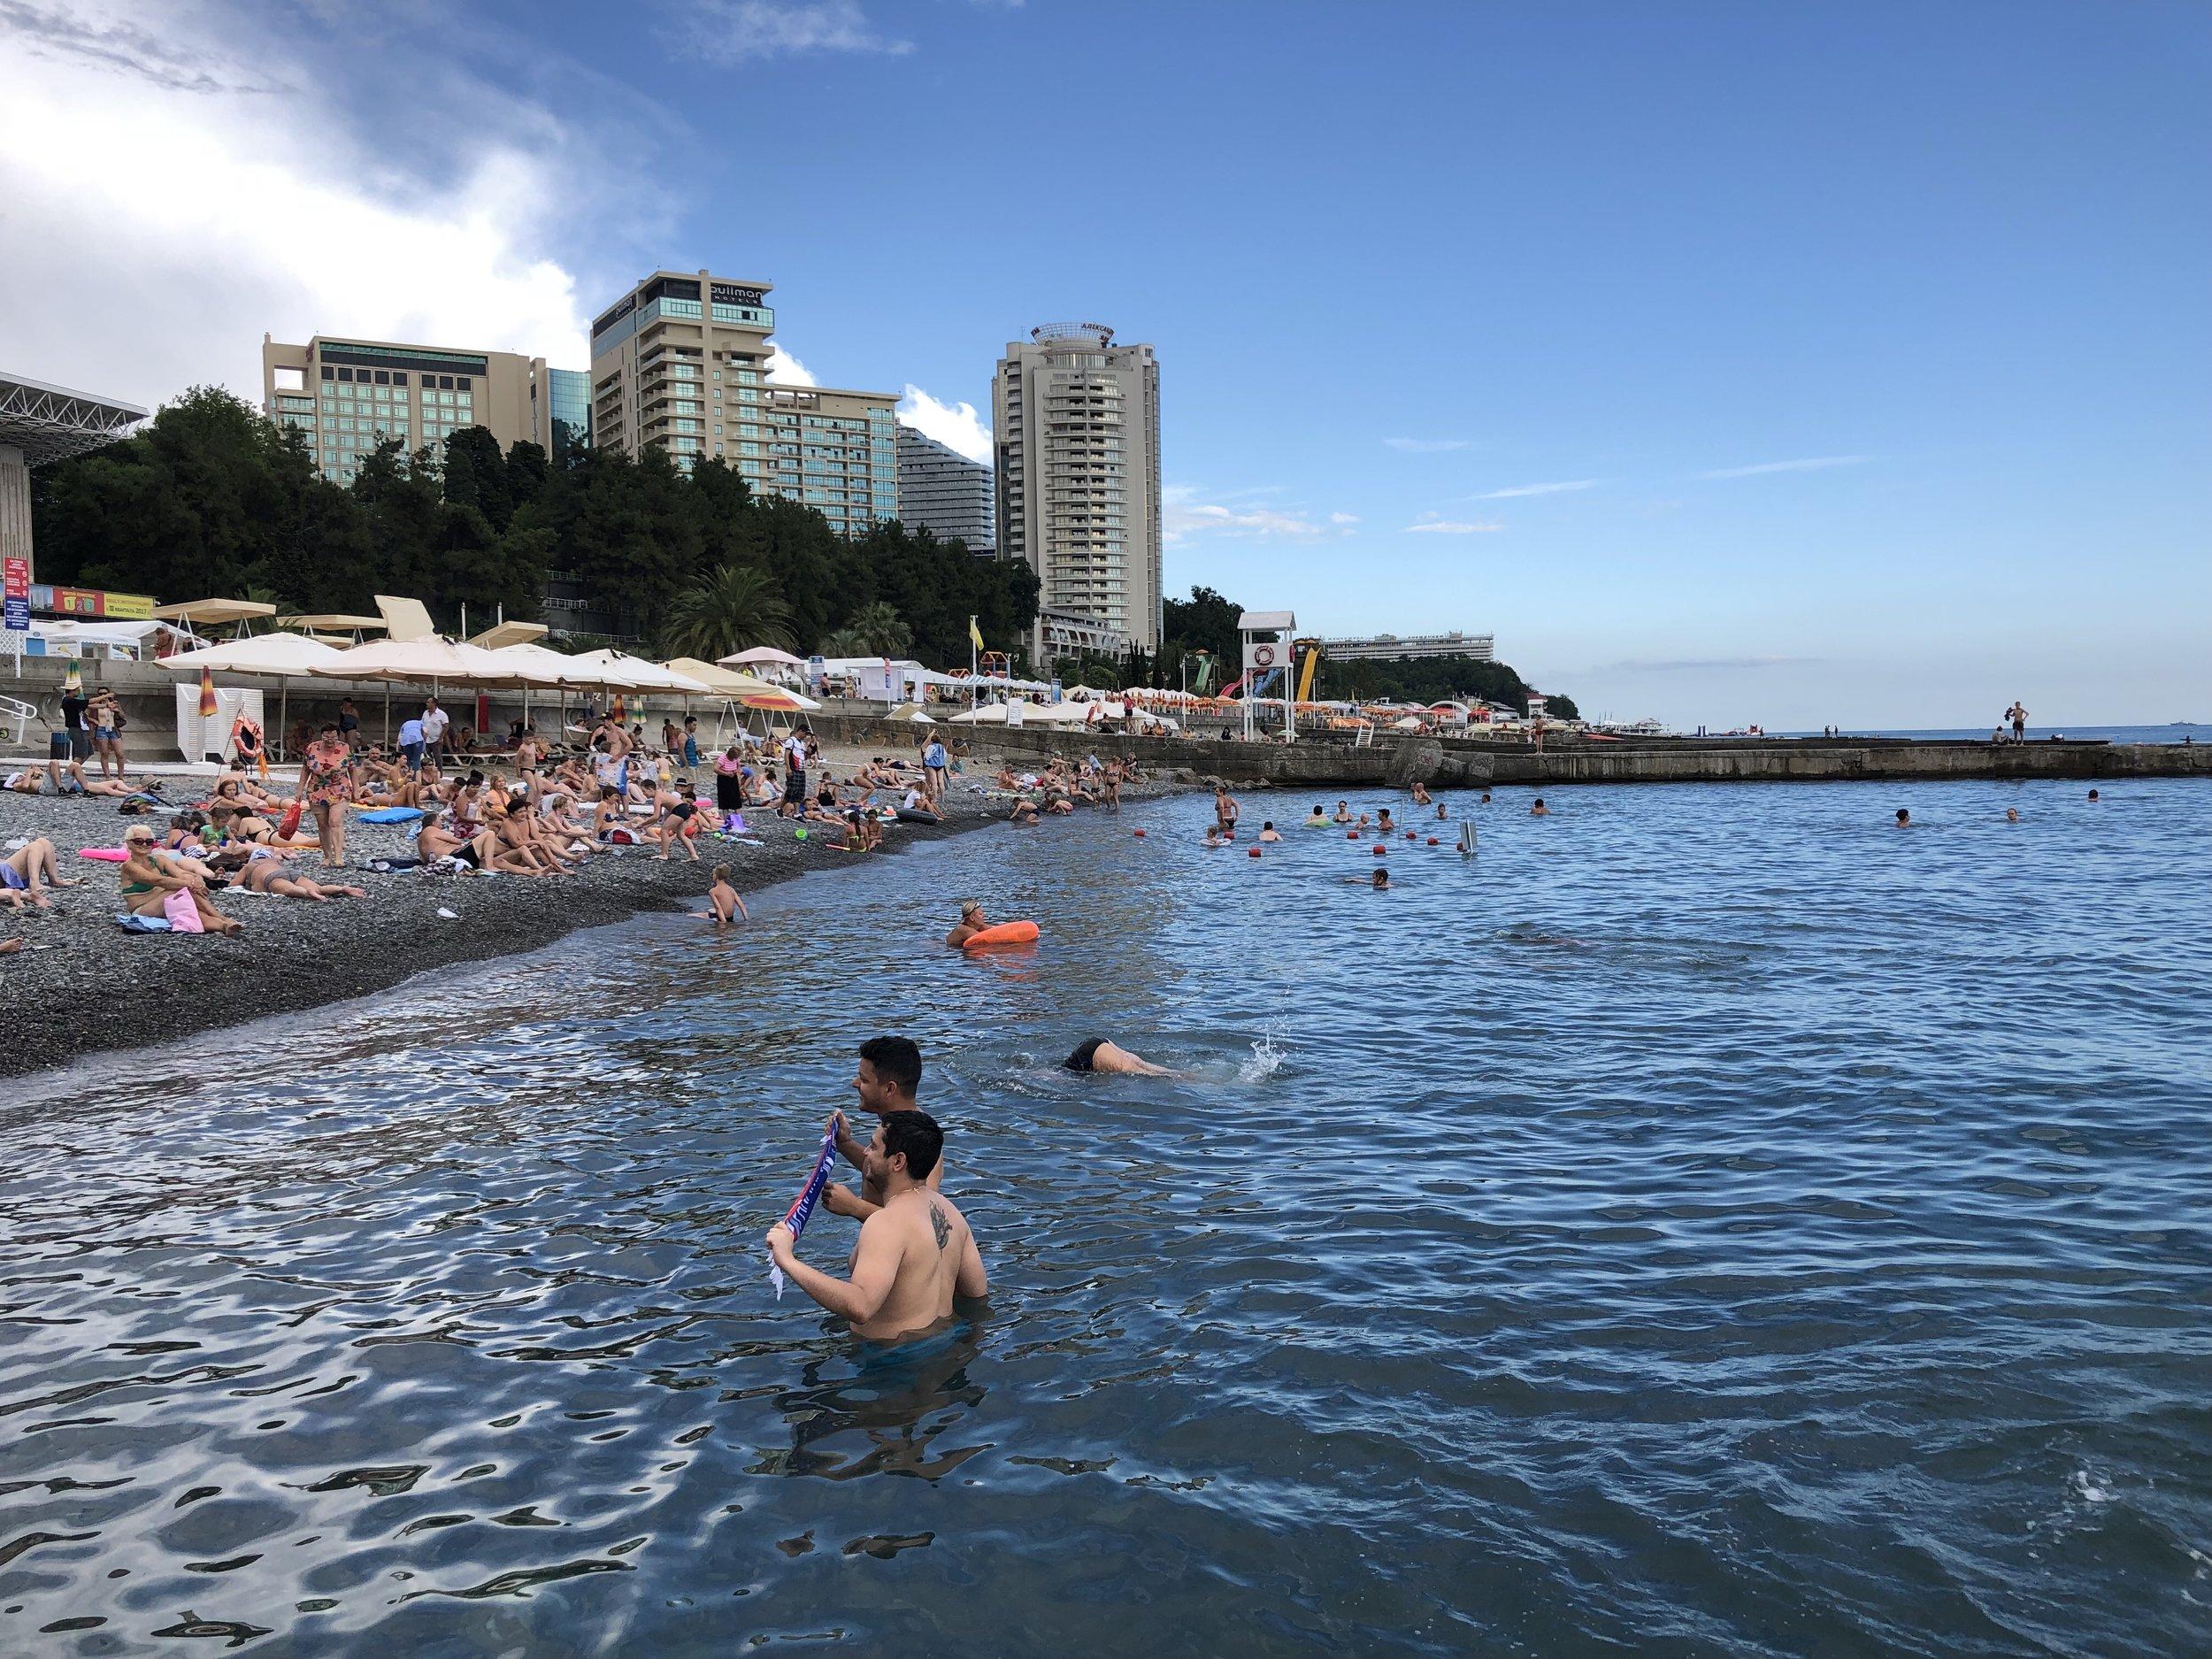 Mayak Beach on the Black Sea